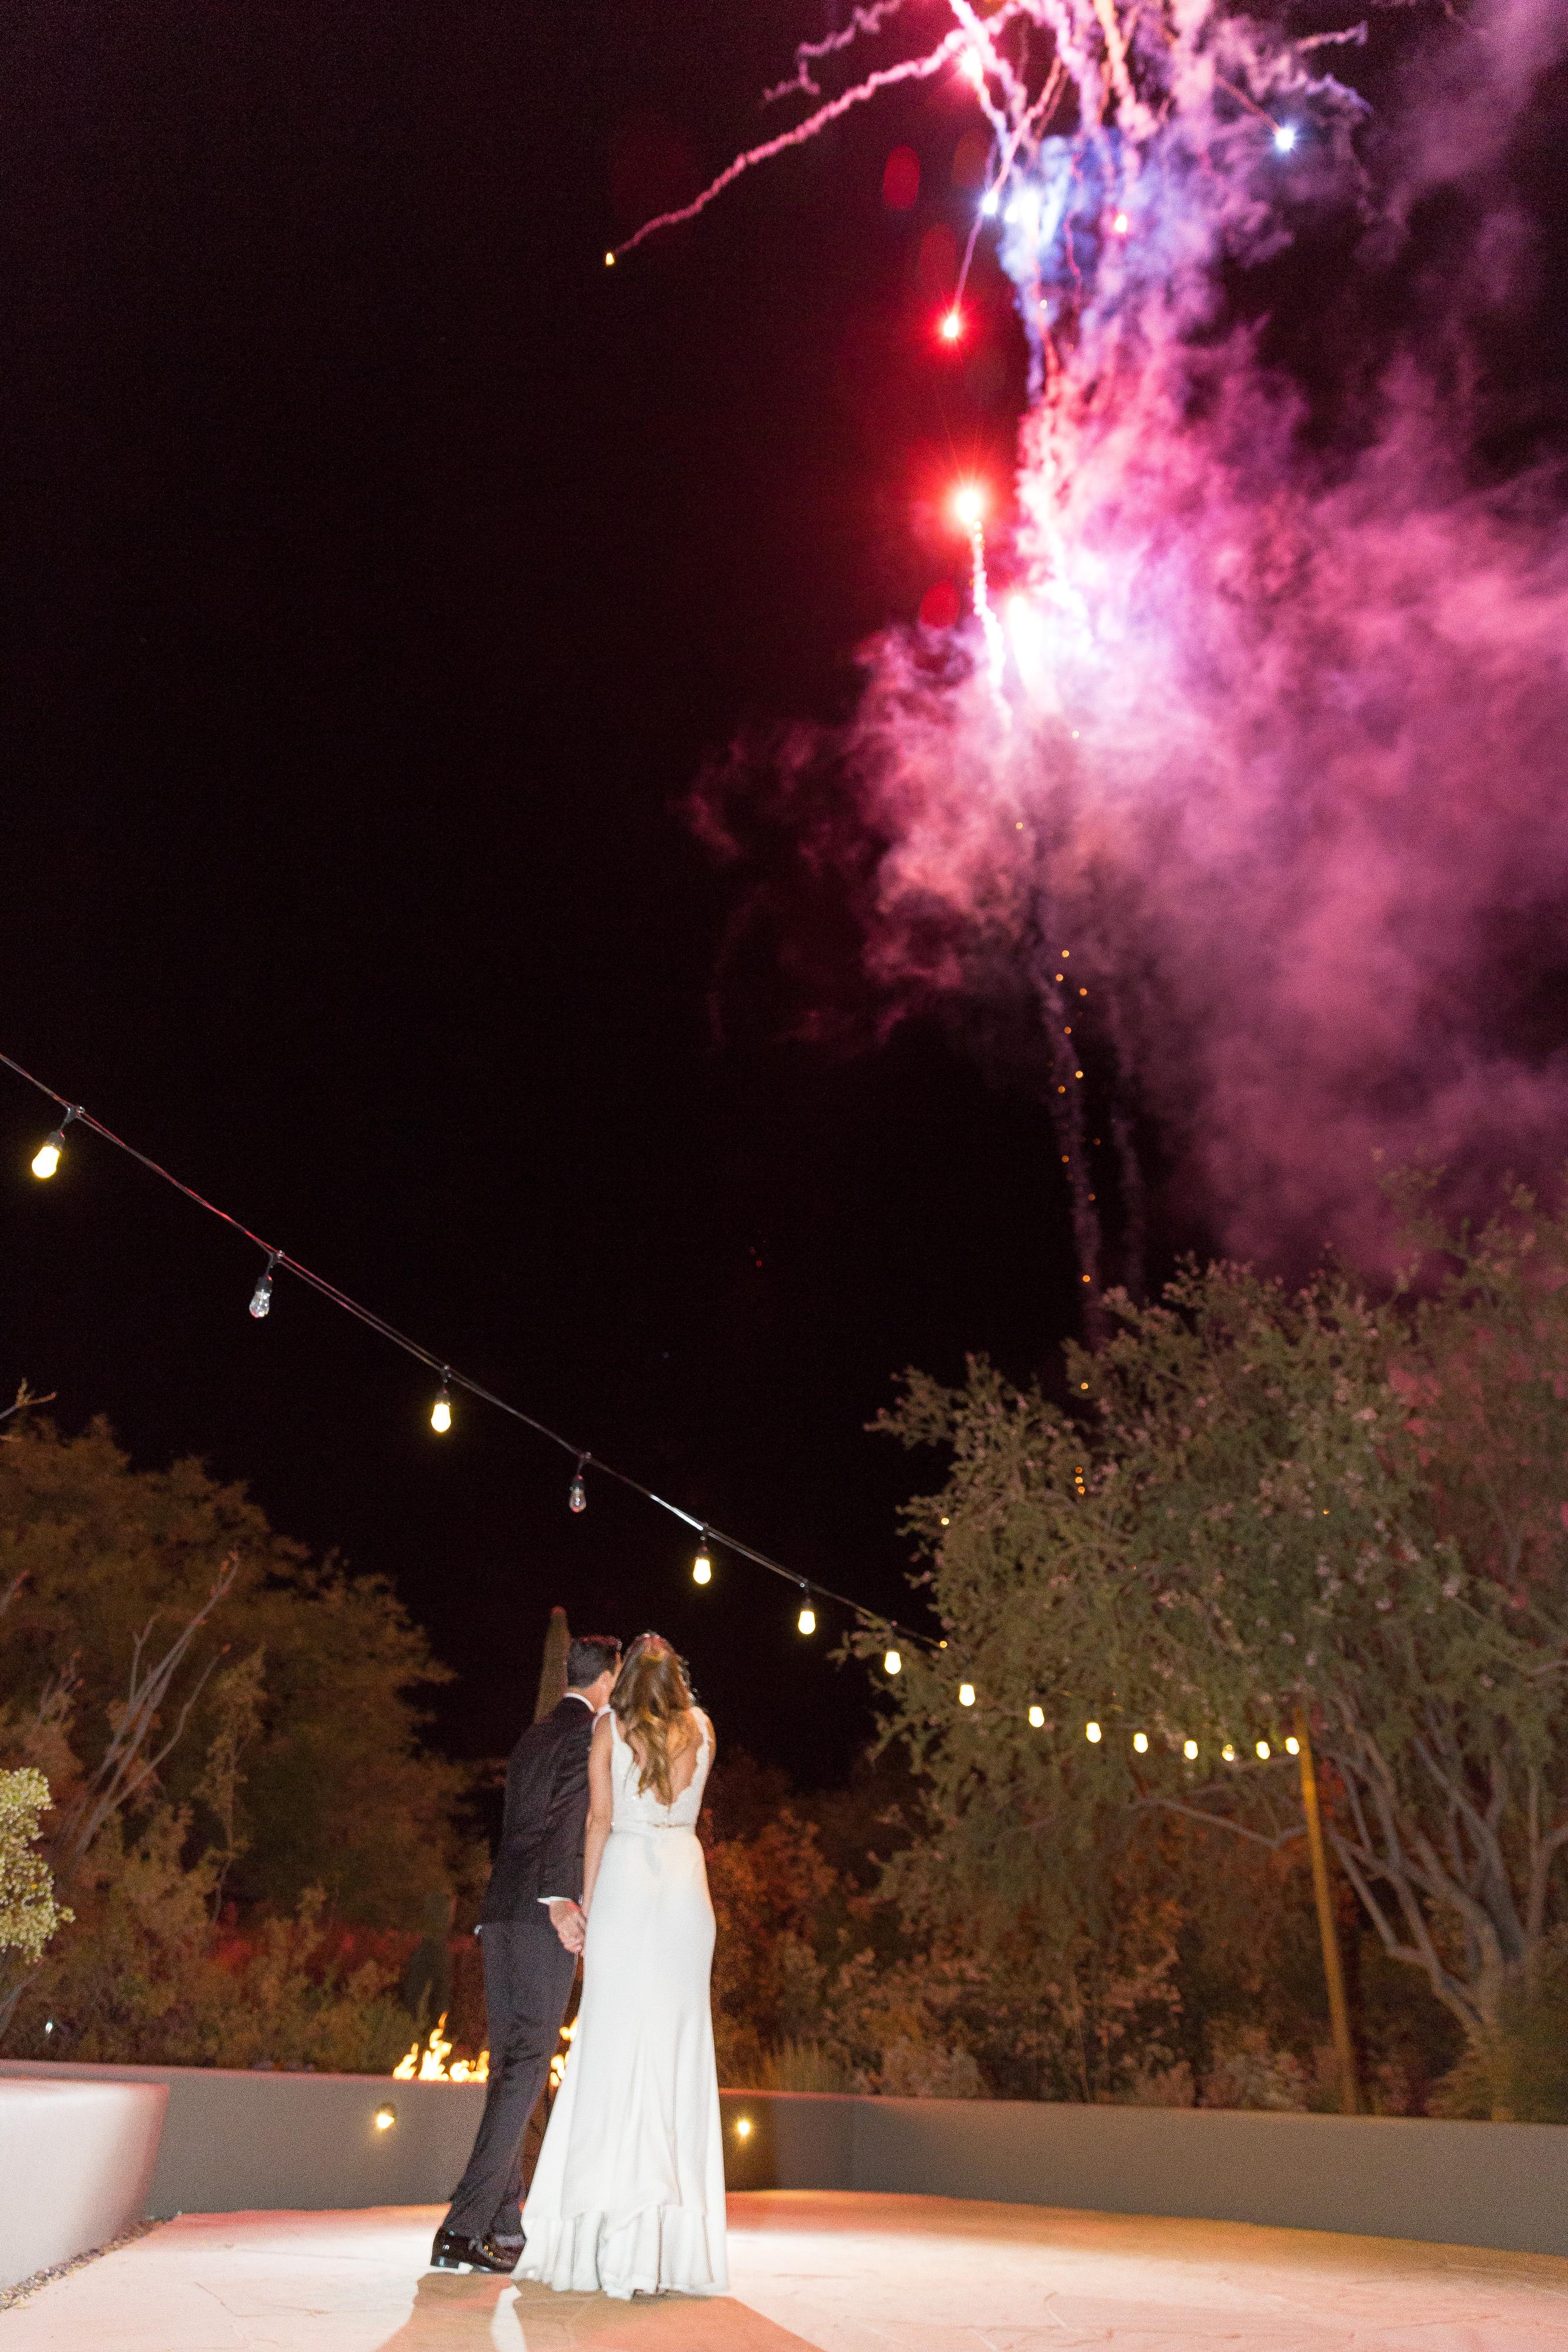 danielle-evan-wedding-april-1716090_1